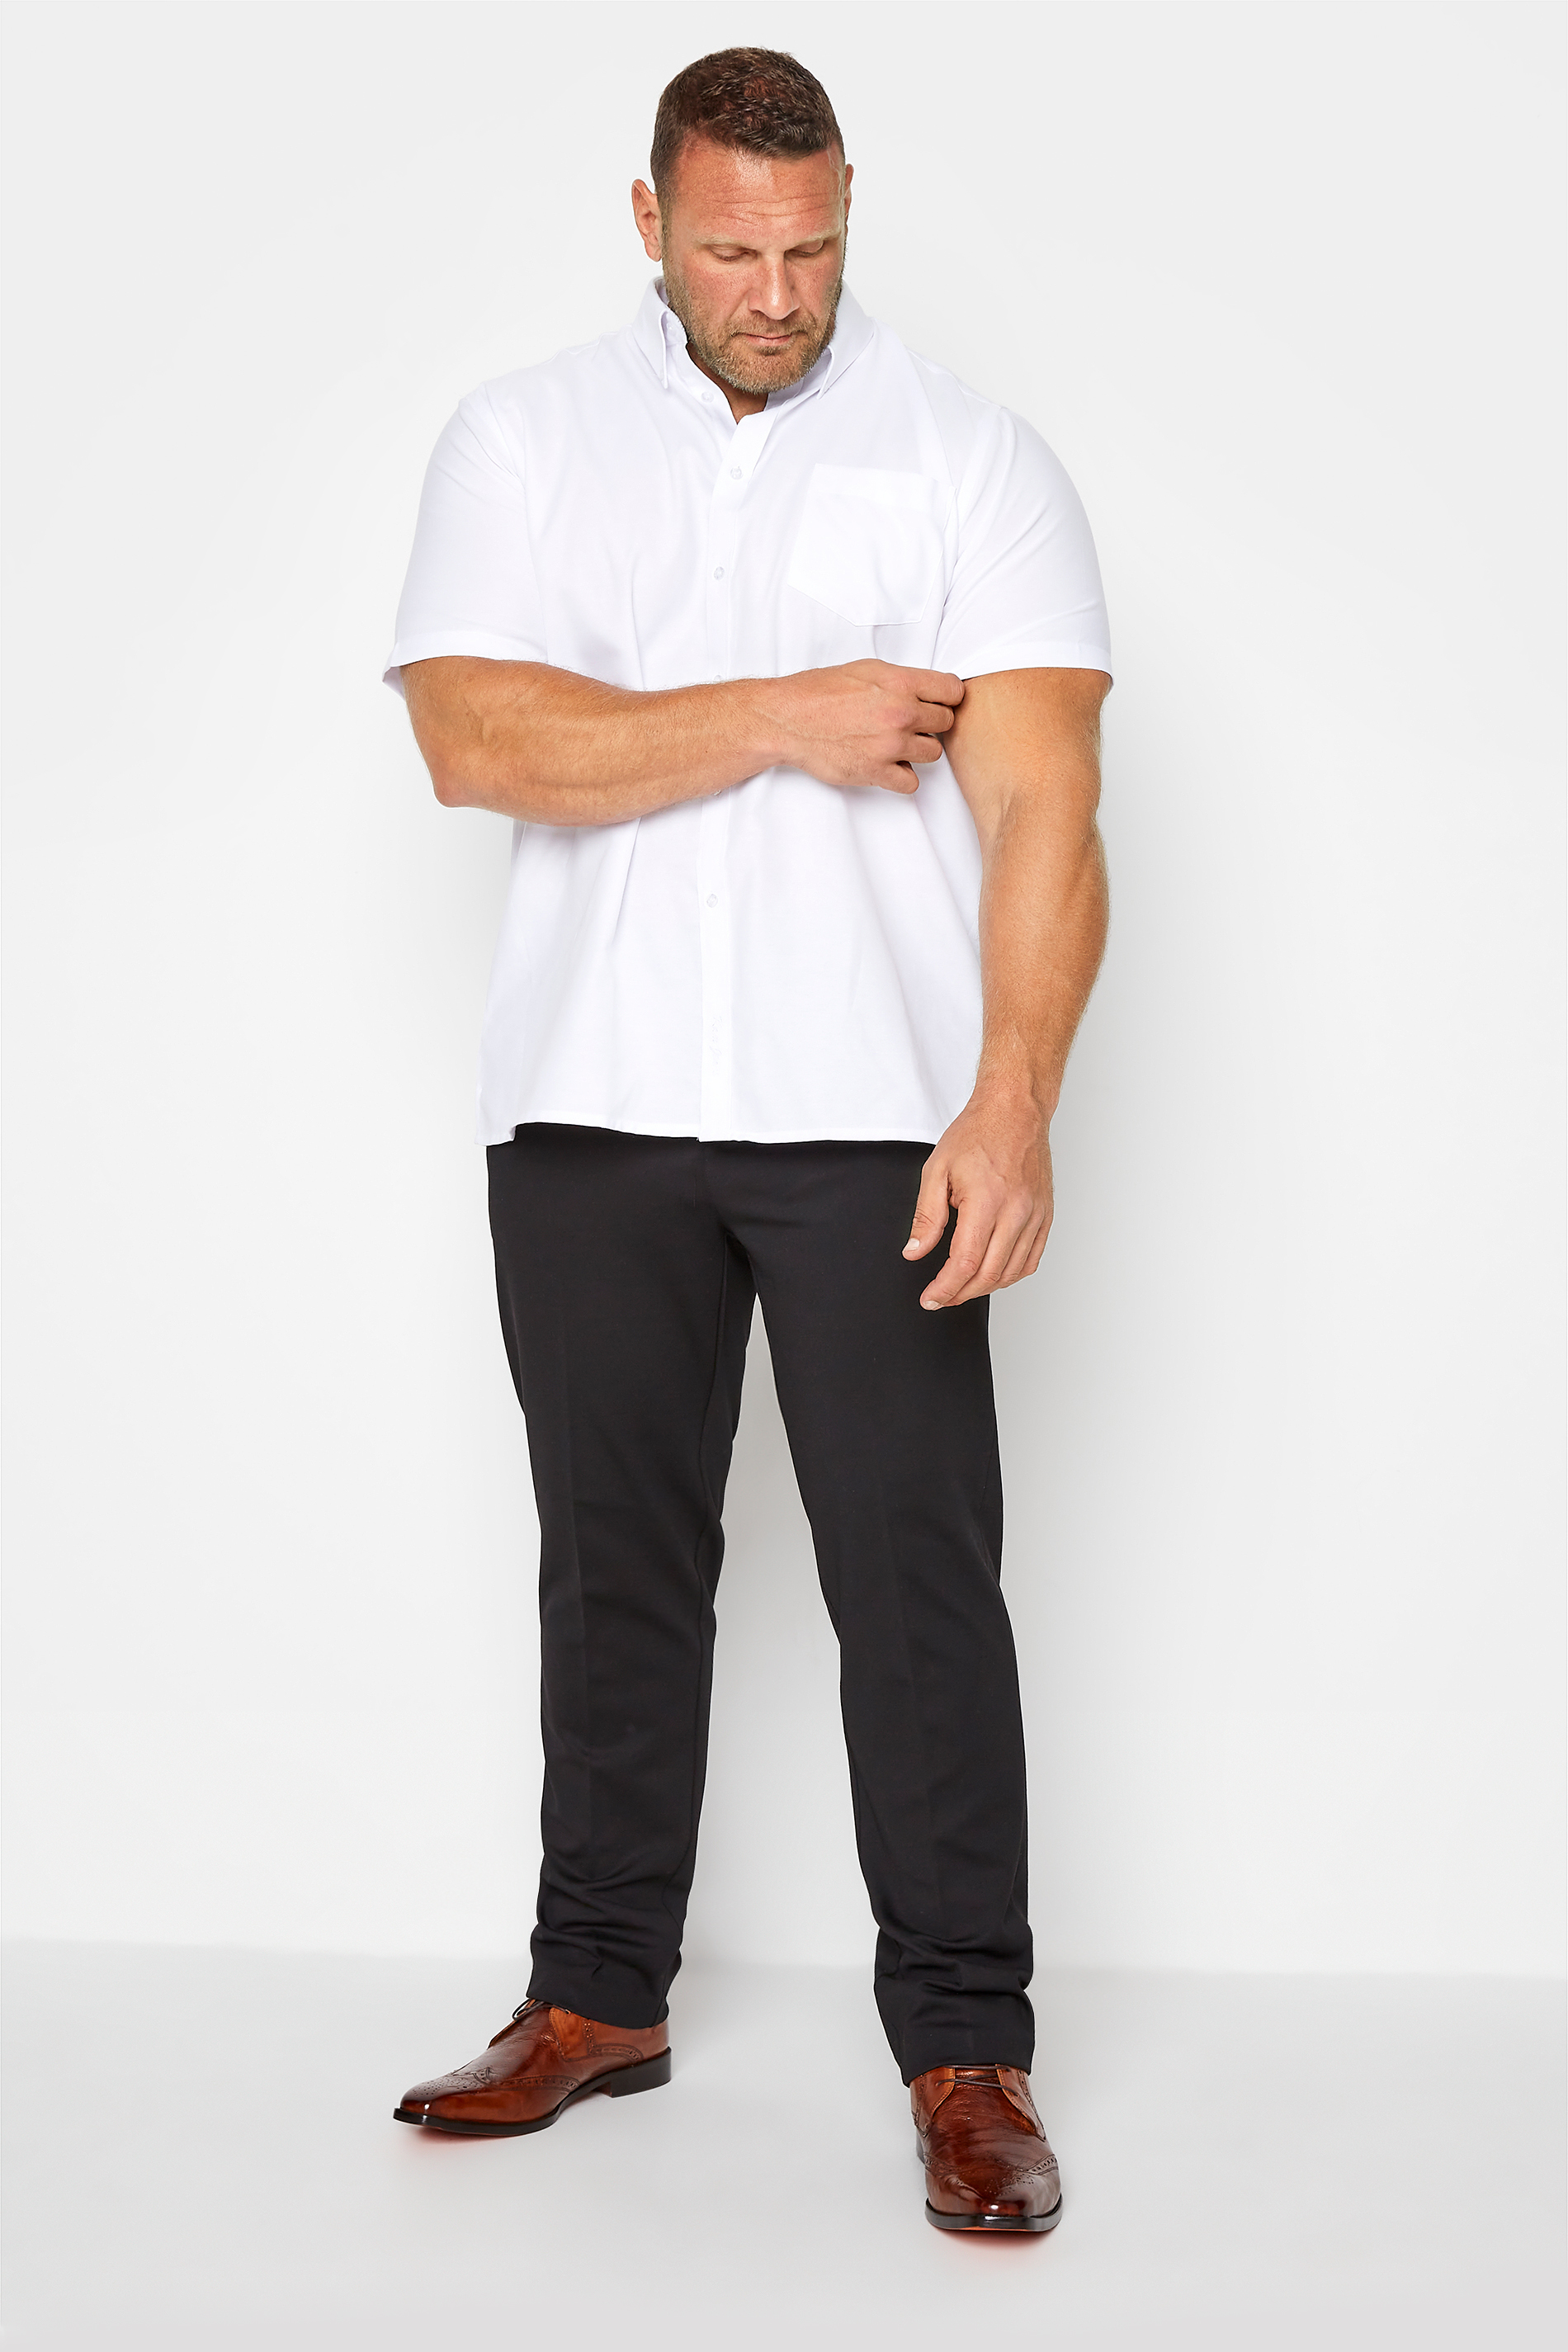 D555 Black Stretch Trousers_205602.jpg